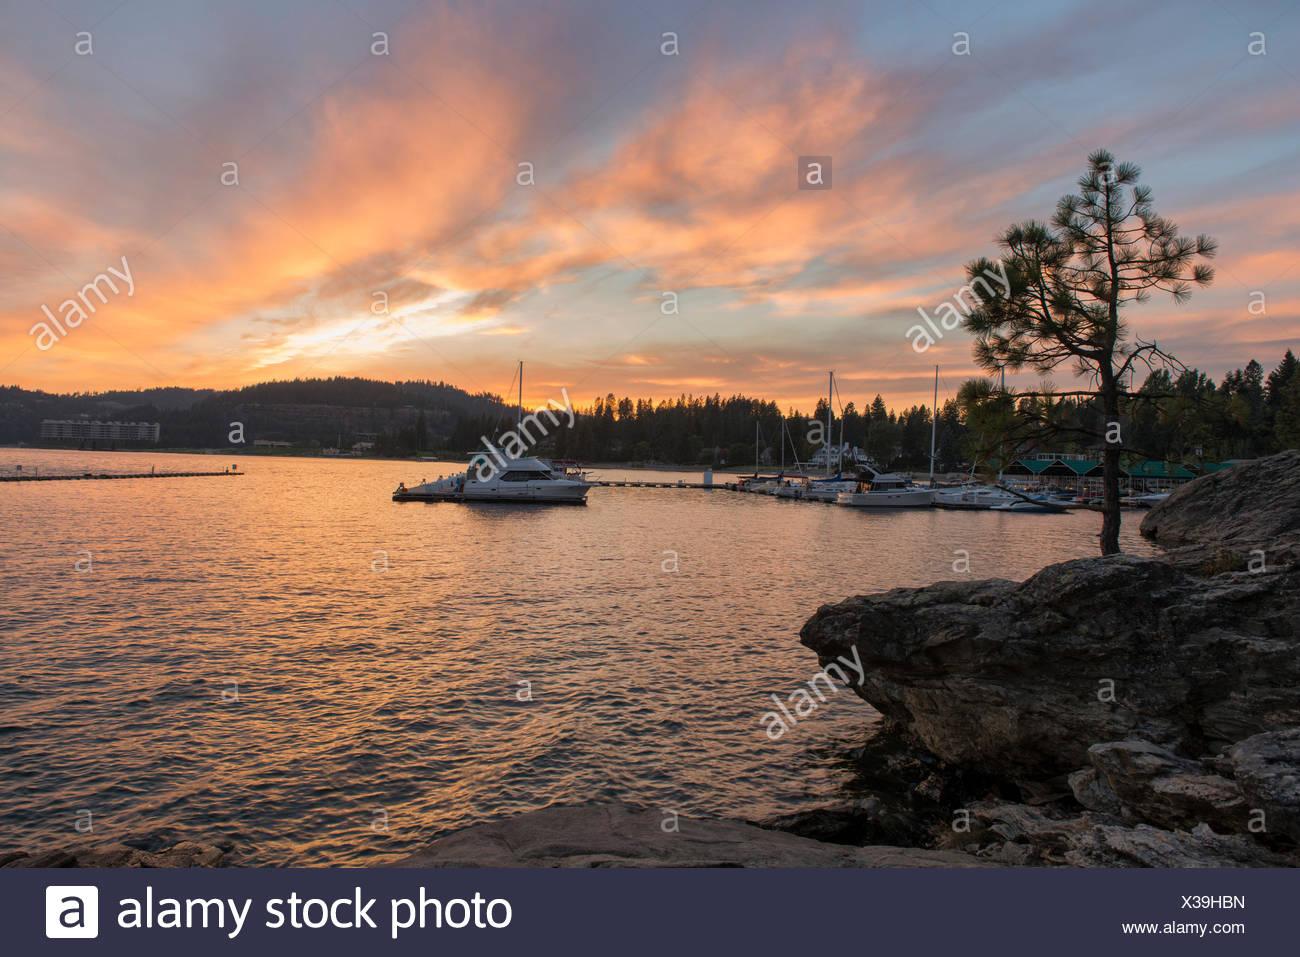 USA, United States, America, Idaho, Coeur d'Alene, shore, Rockies, rocky mountains, sunset, lakefront, evening, boats - Stock Image